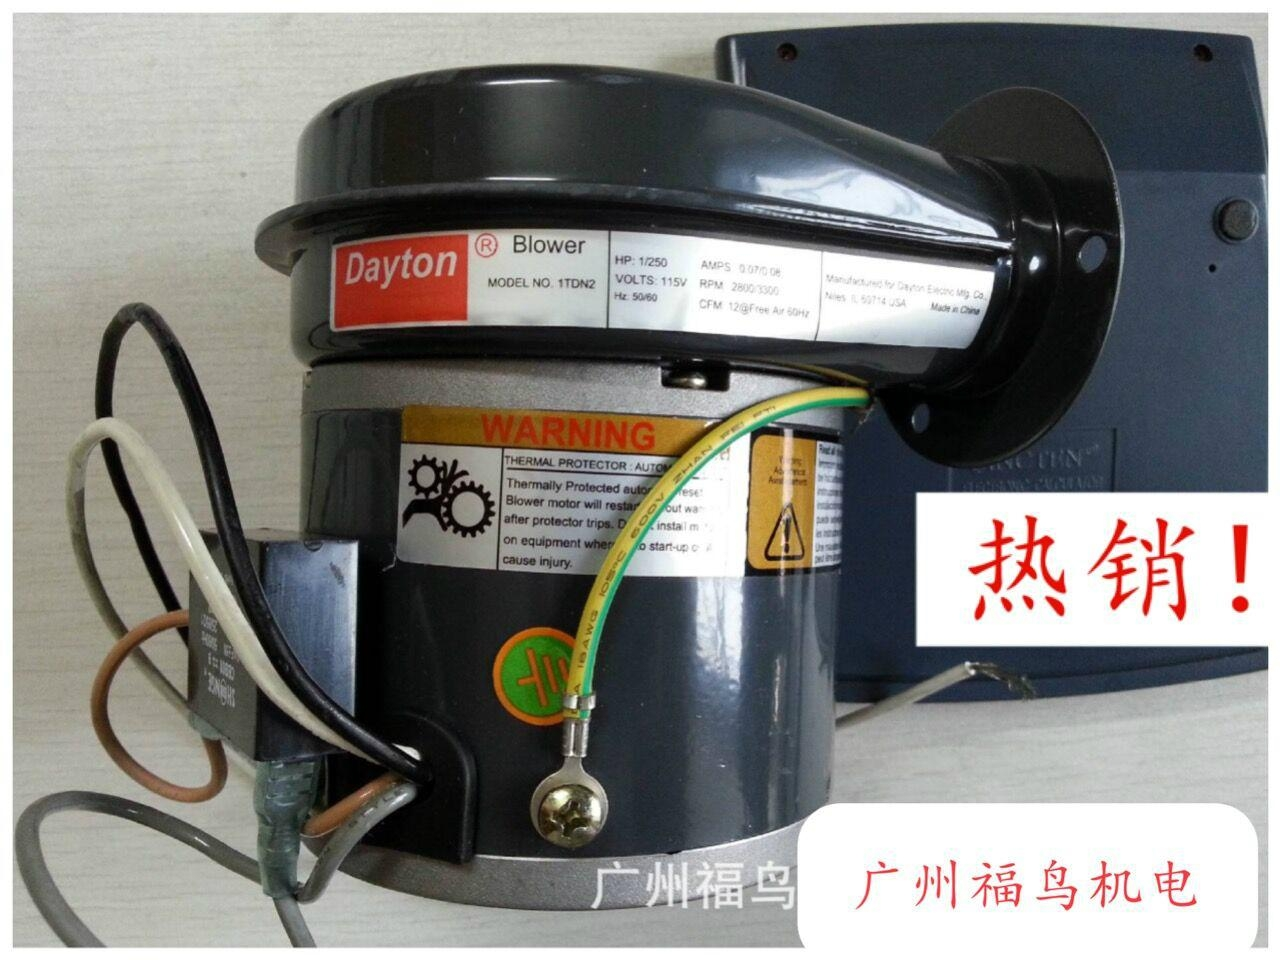 DAYTON風機  型號: 1TDN2